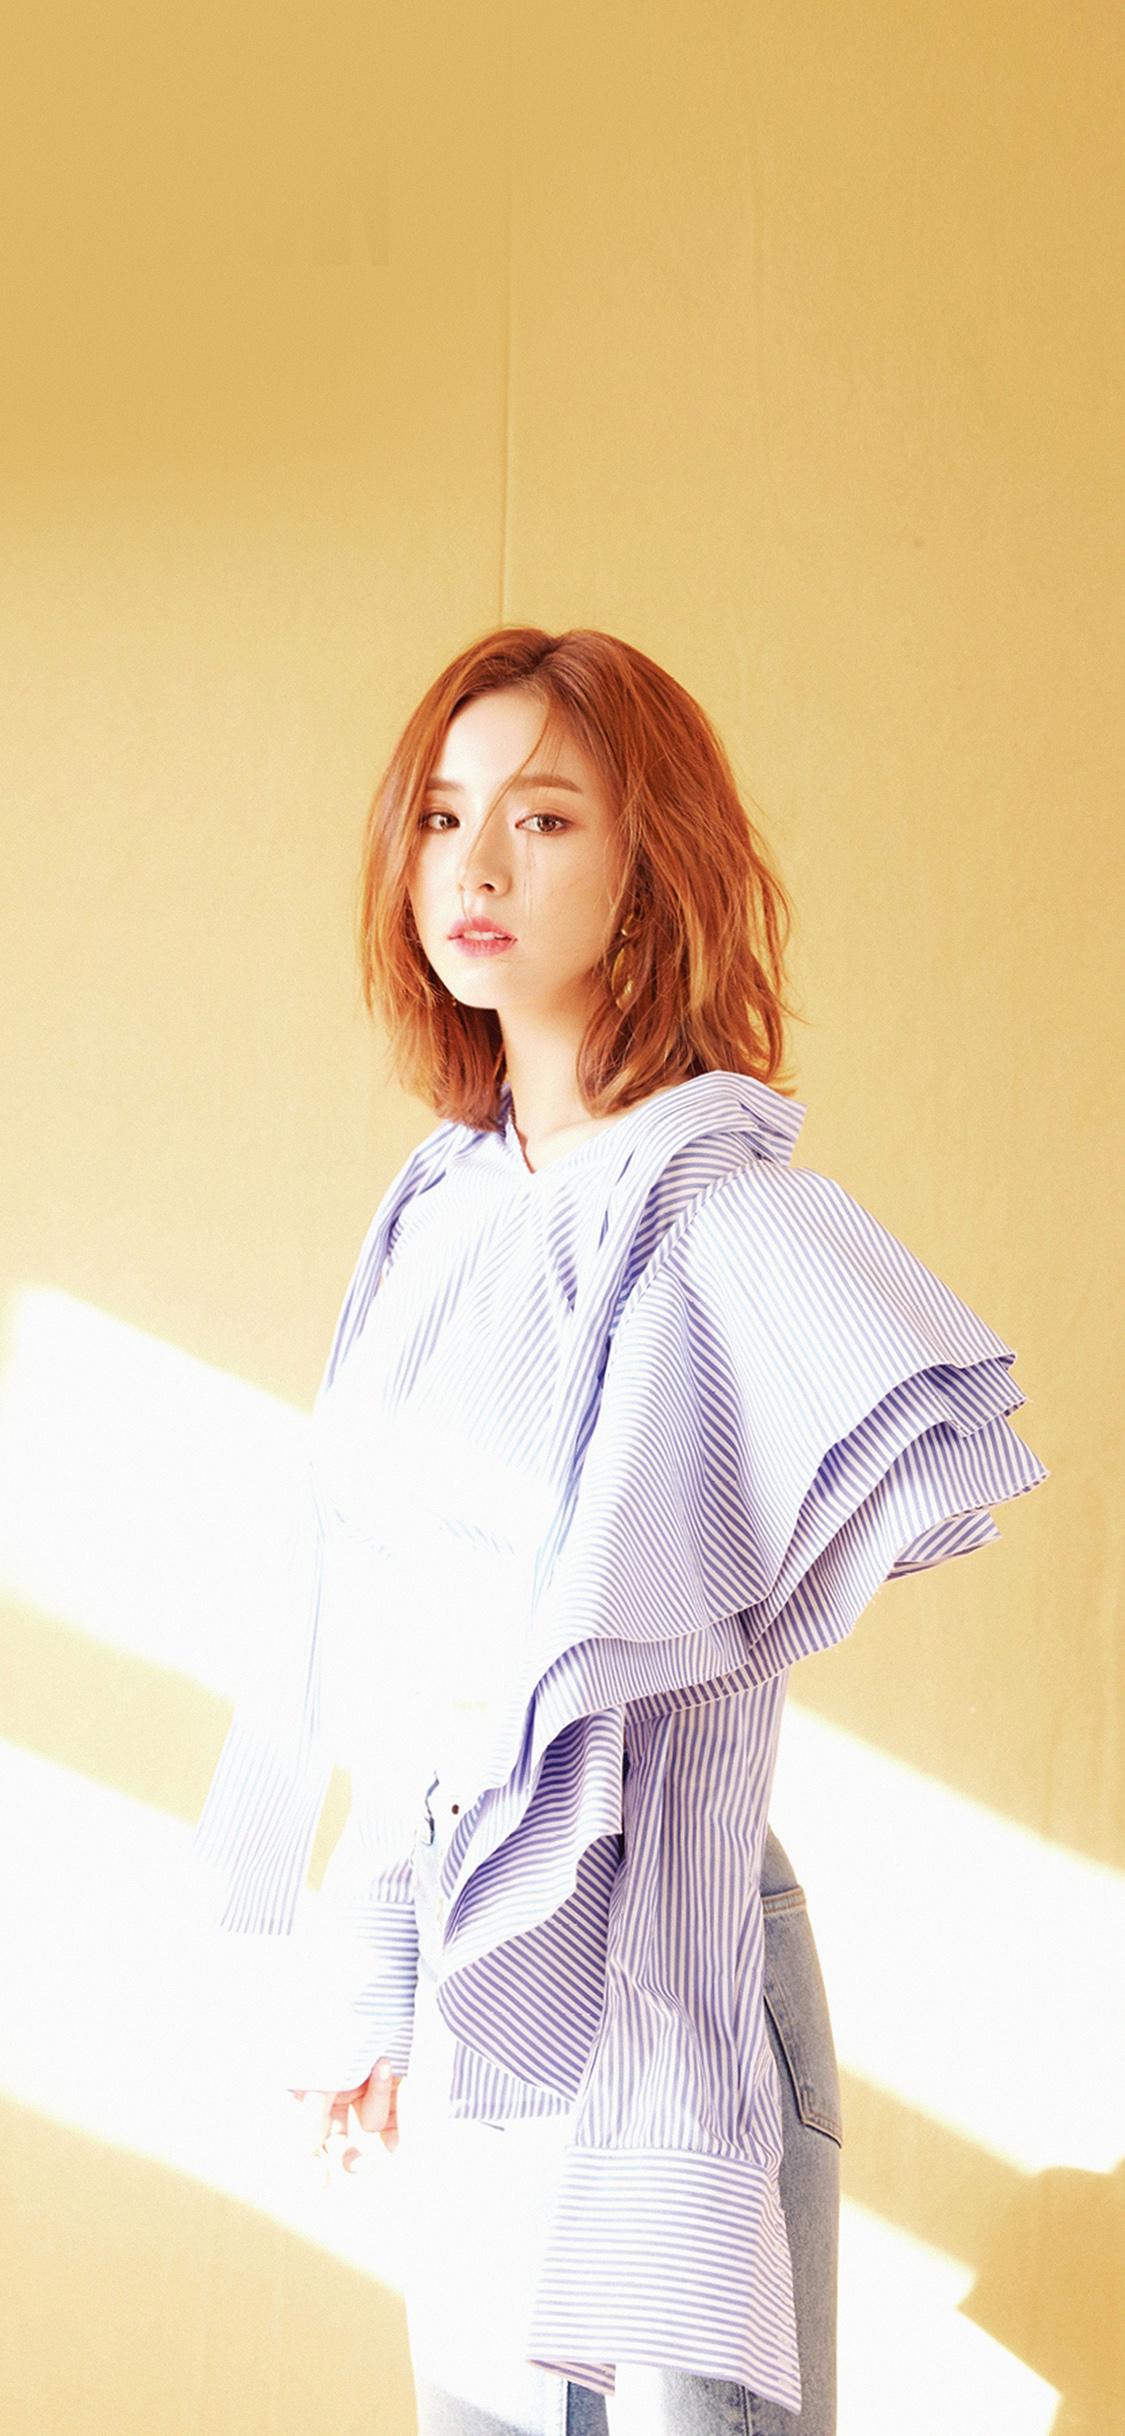 Small Cute Girl Wallpaper Ho19 Girl Korean Asian Cute Wallpaper